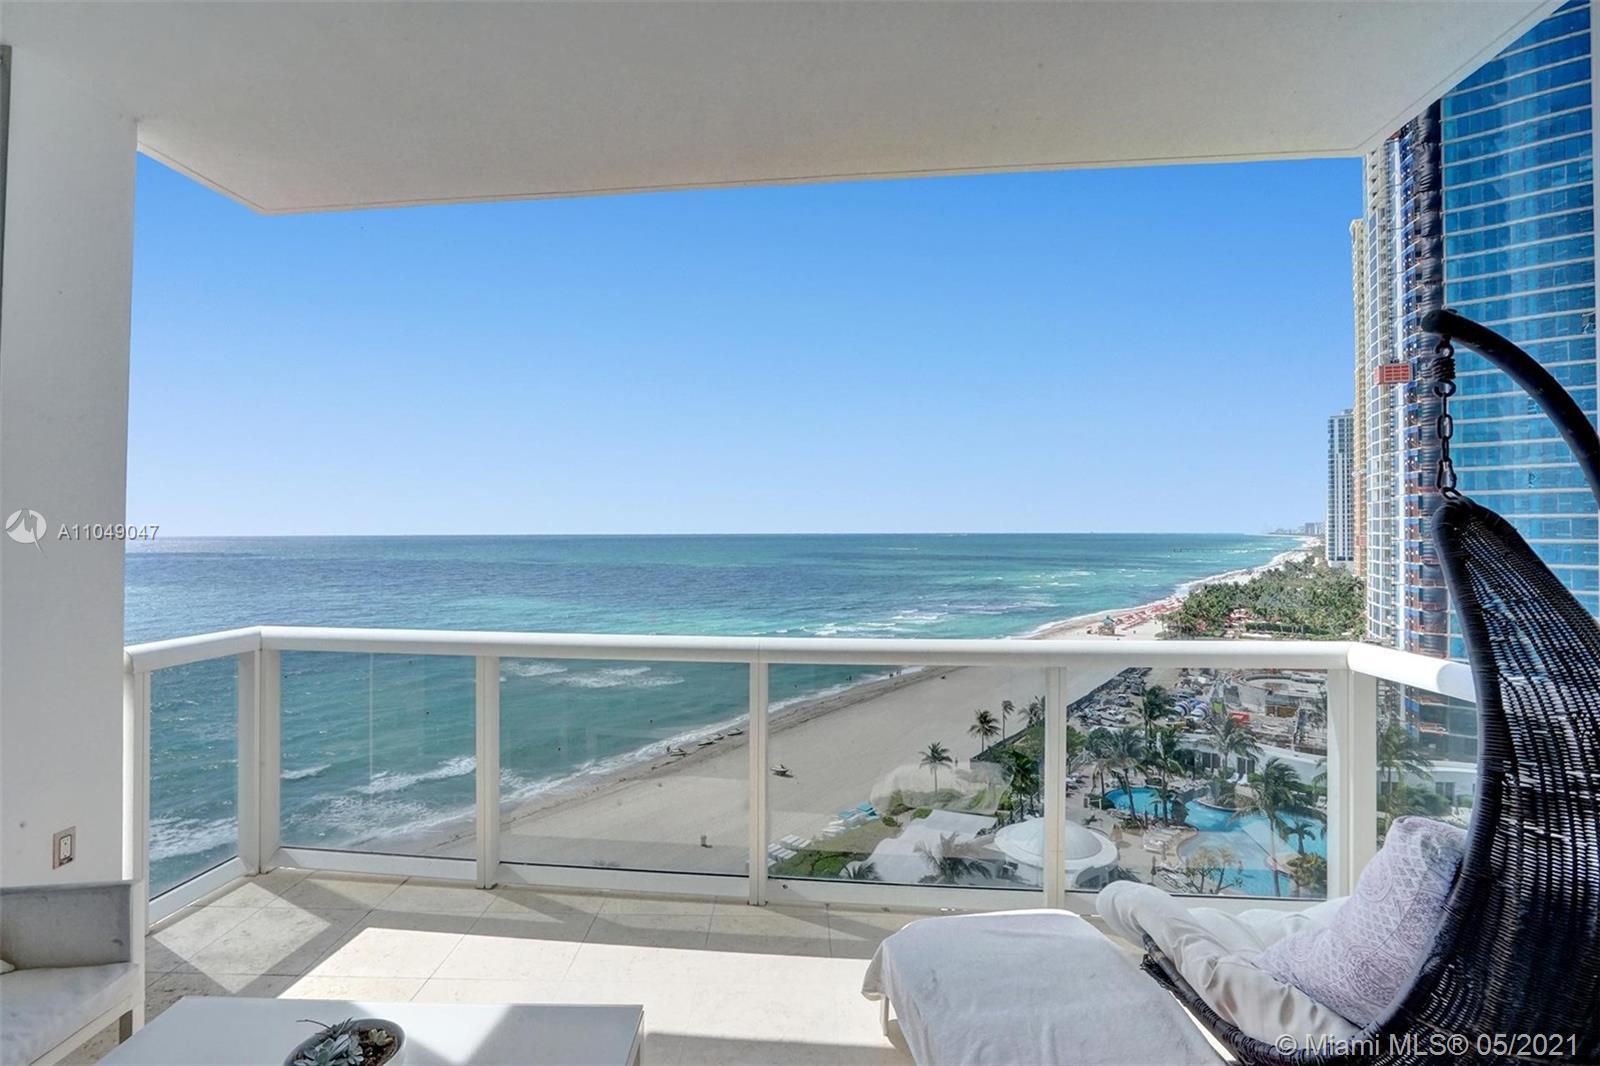 Trump Palace #1405 - 18101 Collins Ave #1405, Sunny Isles Beach, FL 33160